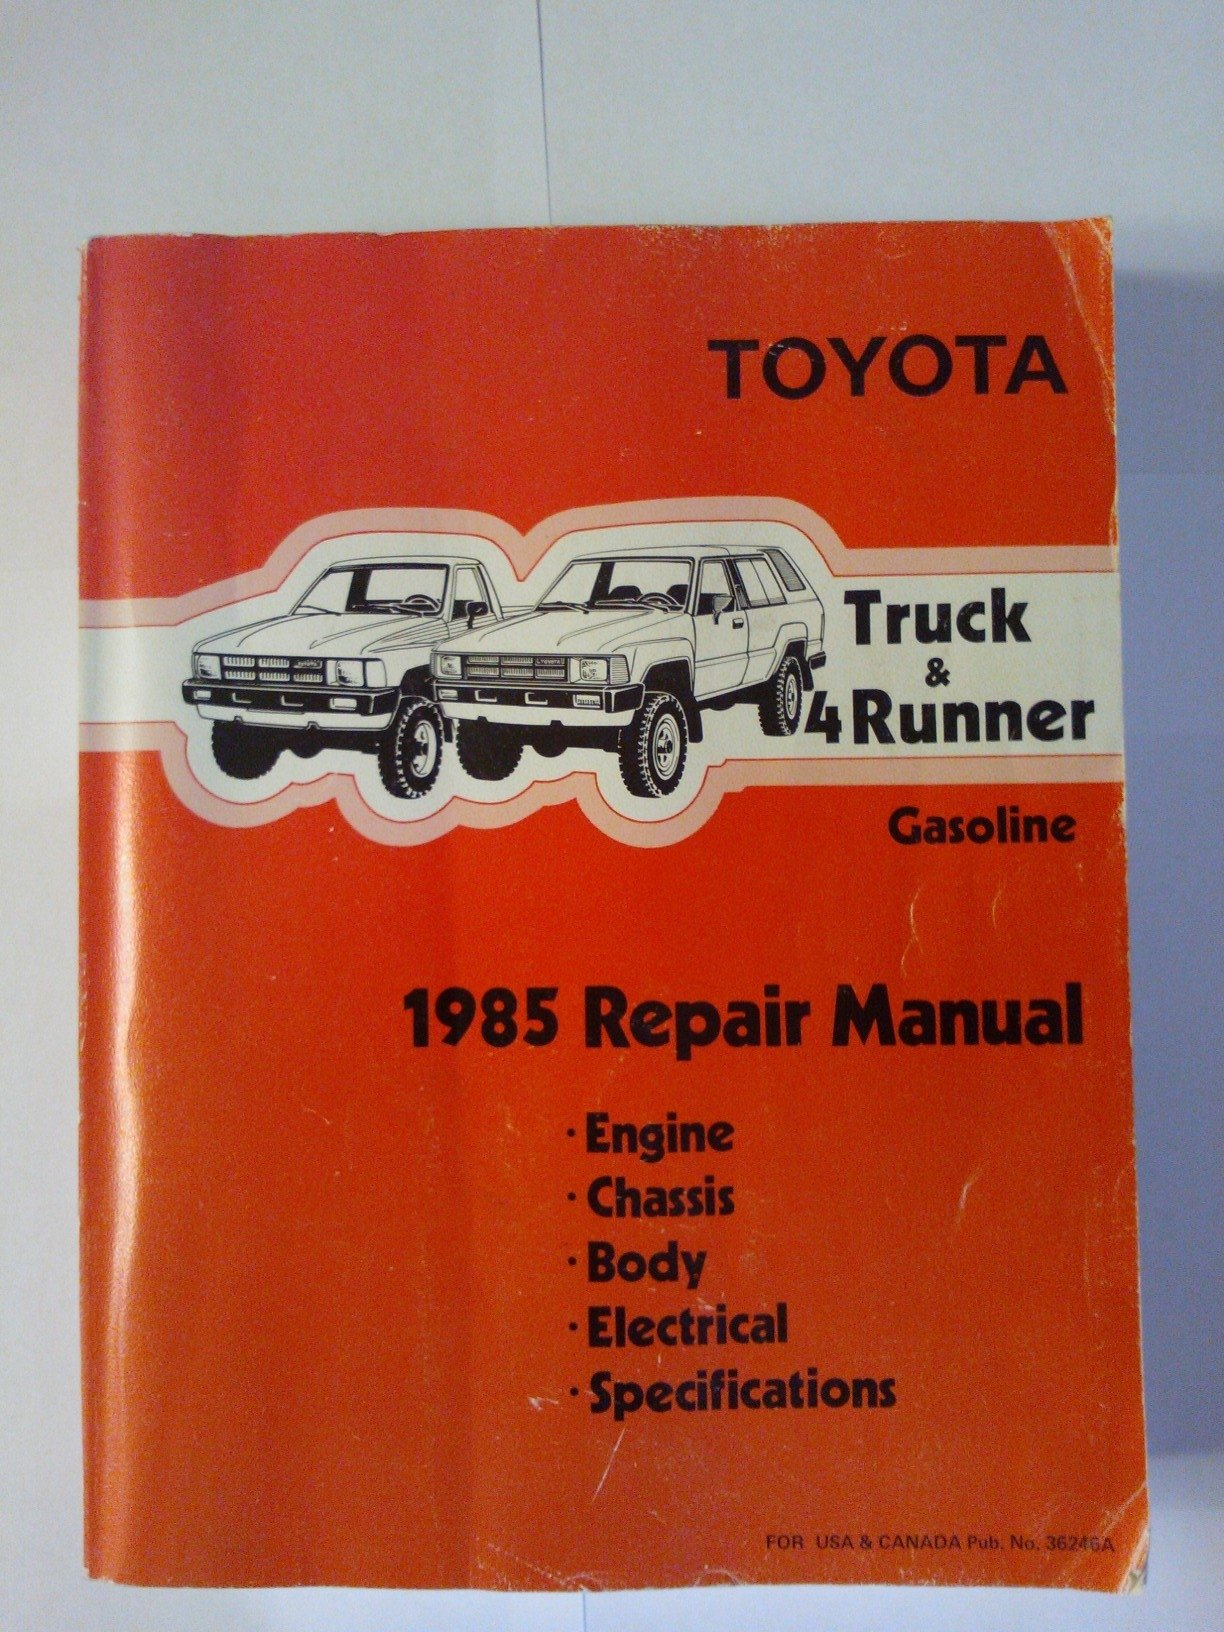 Toyota Truck & 4Runner Gasoline: 1985 Repair Manual: Toyota Motor  Corporation: Amazon.com: Books